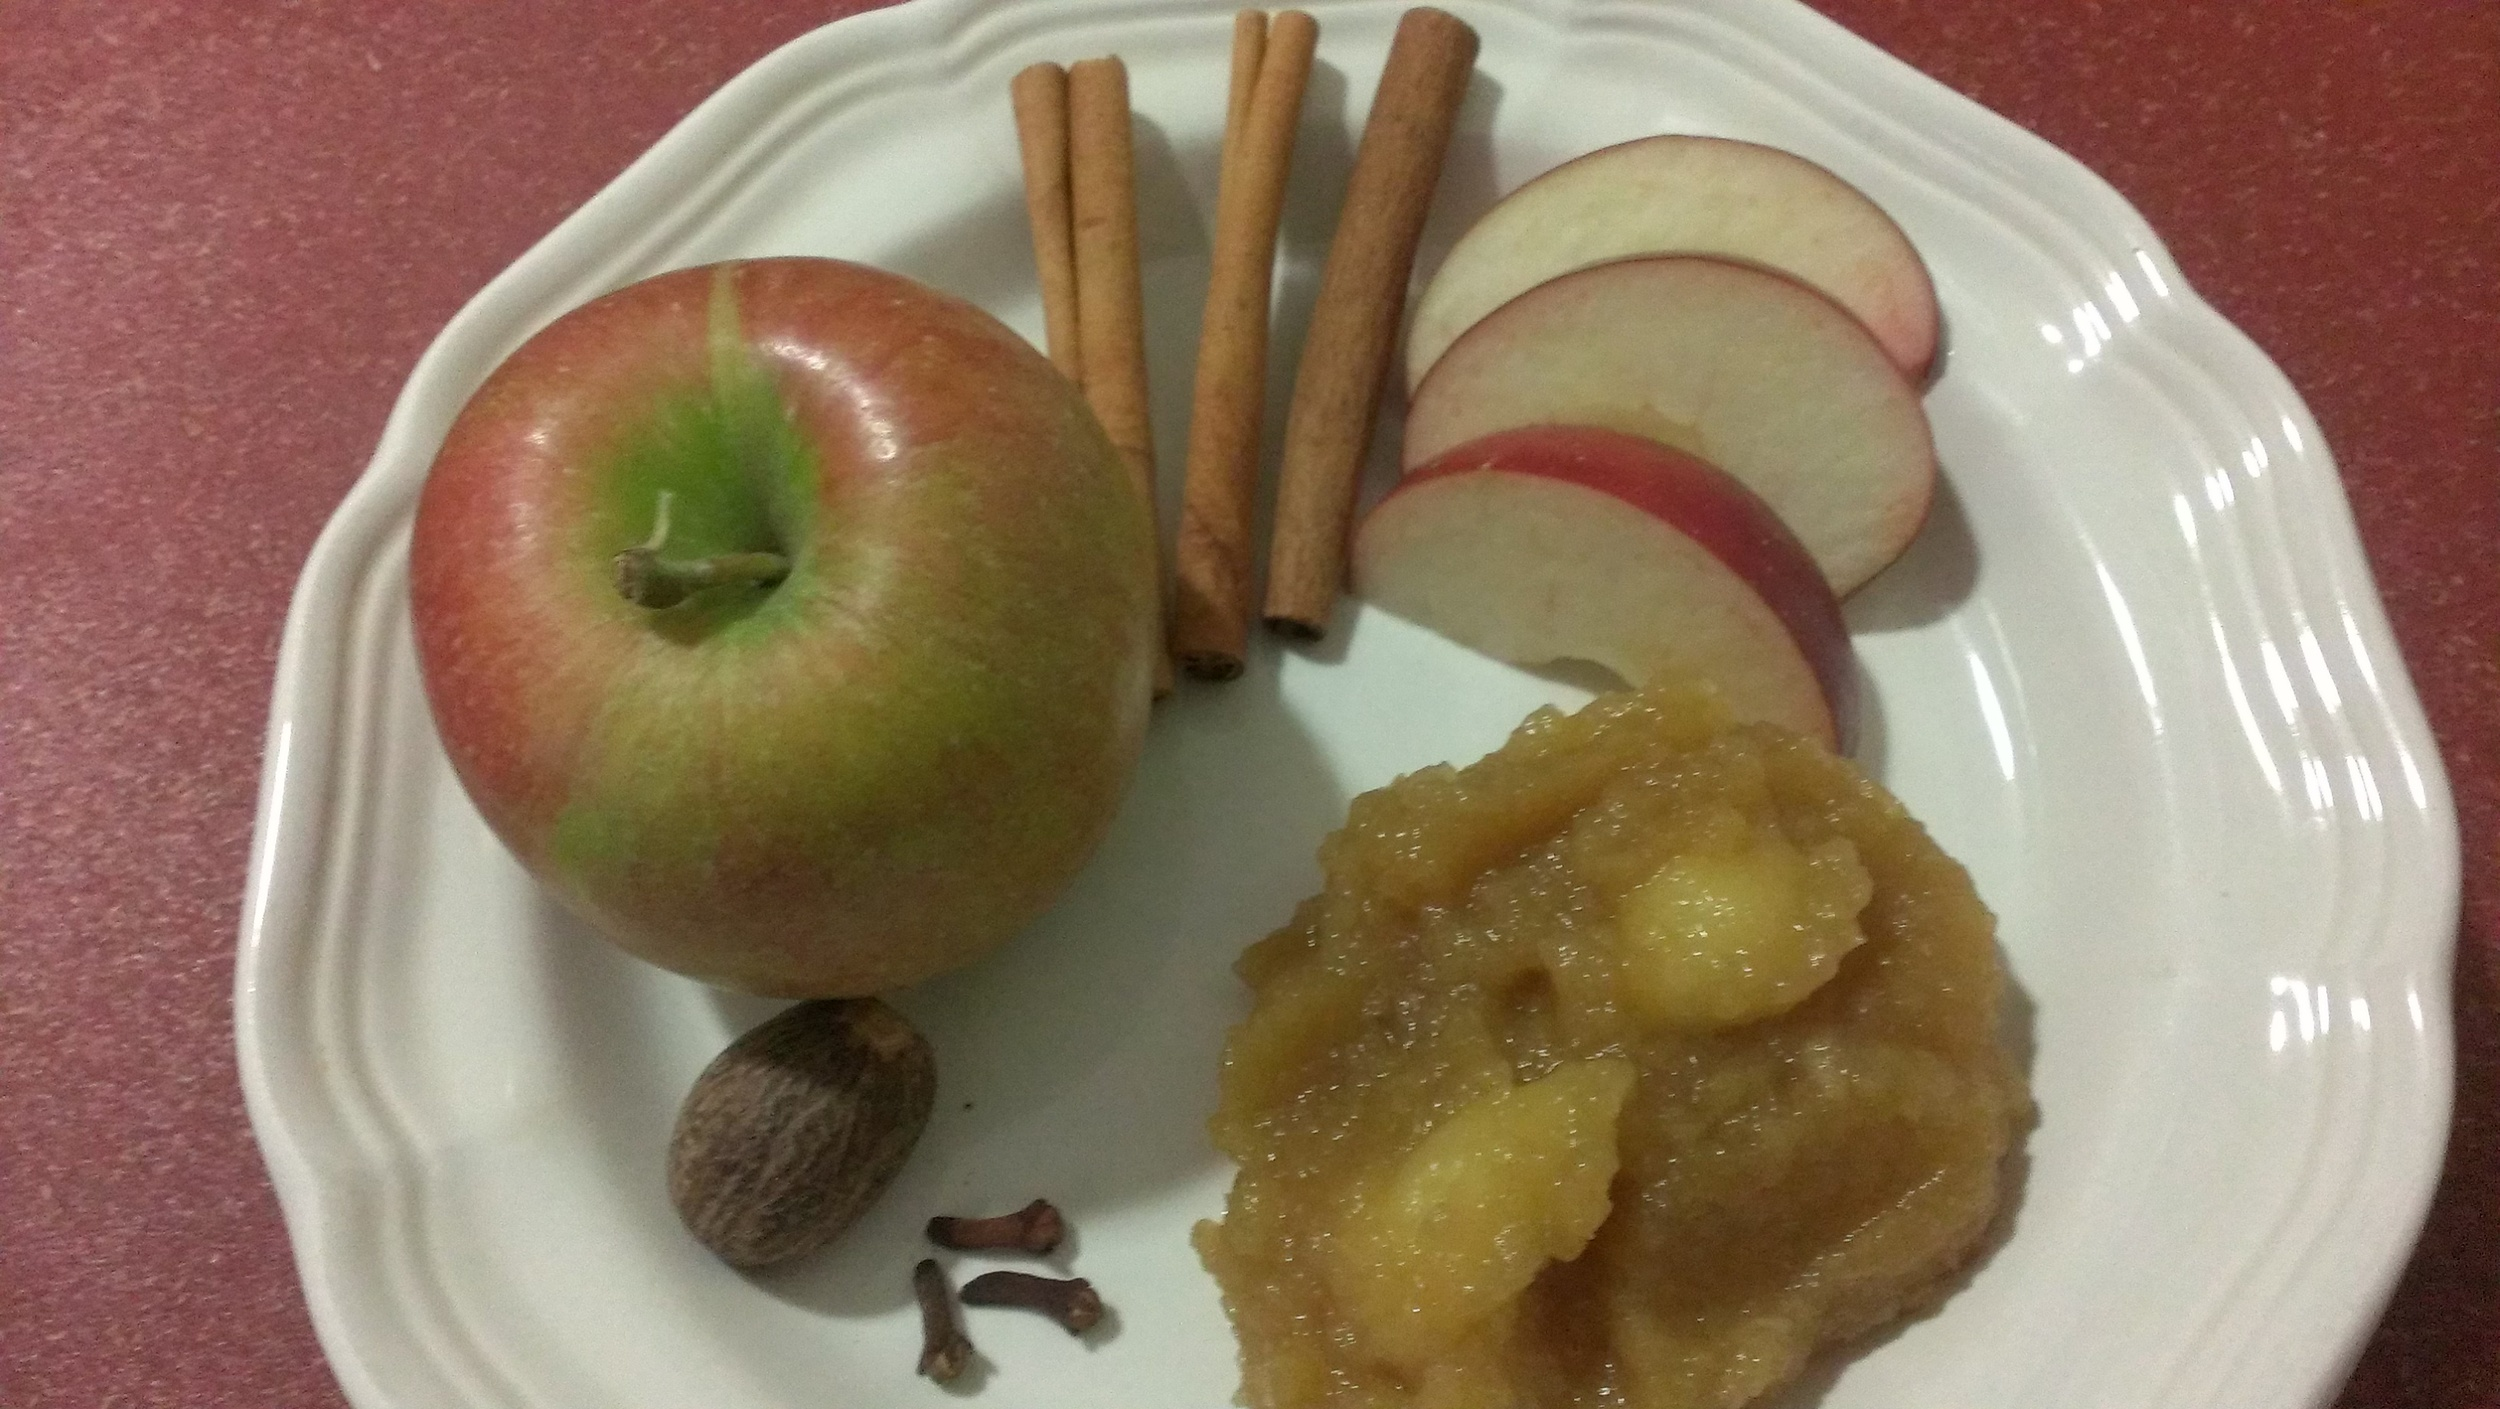 Applesauce.jpg